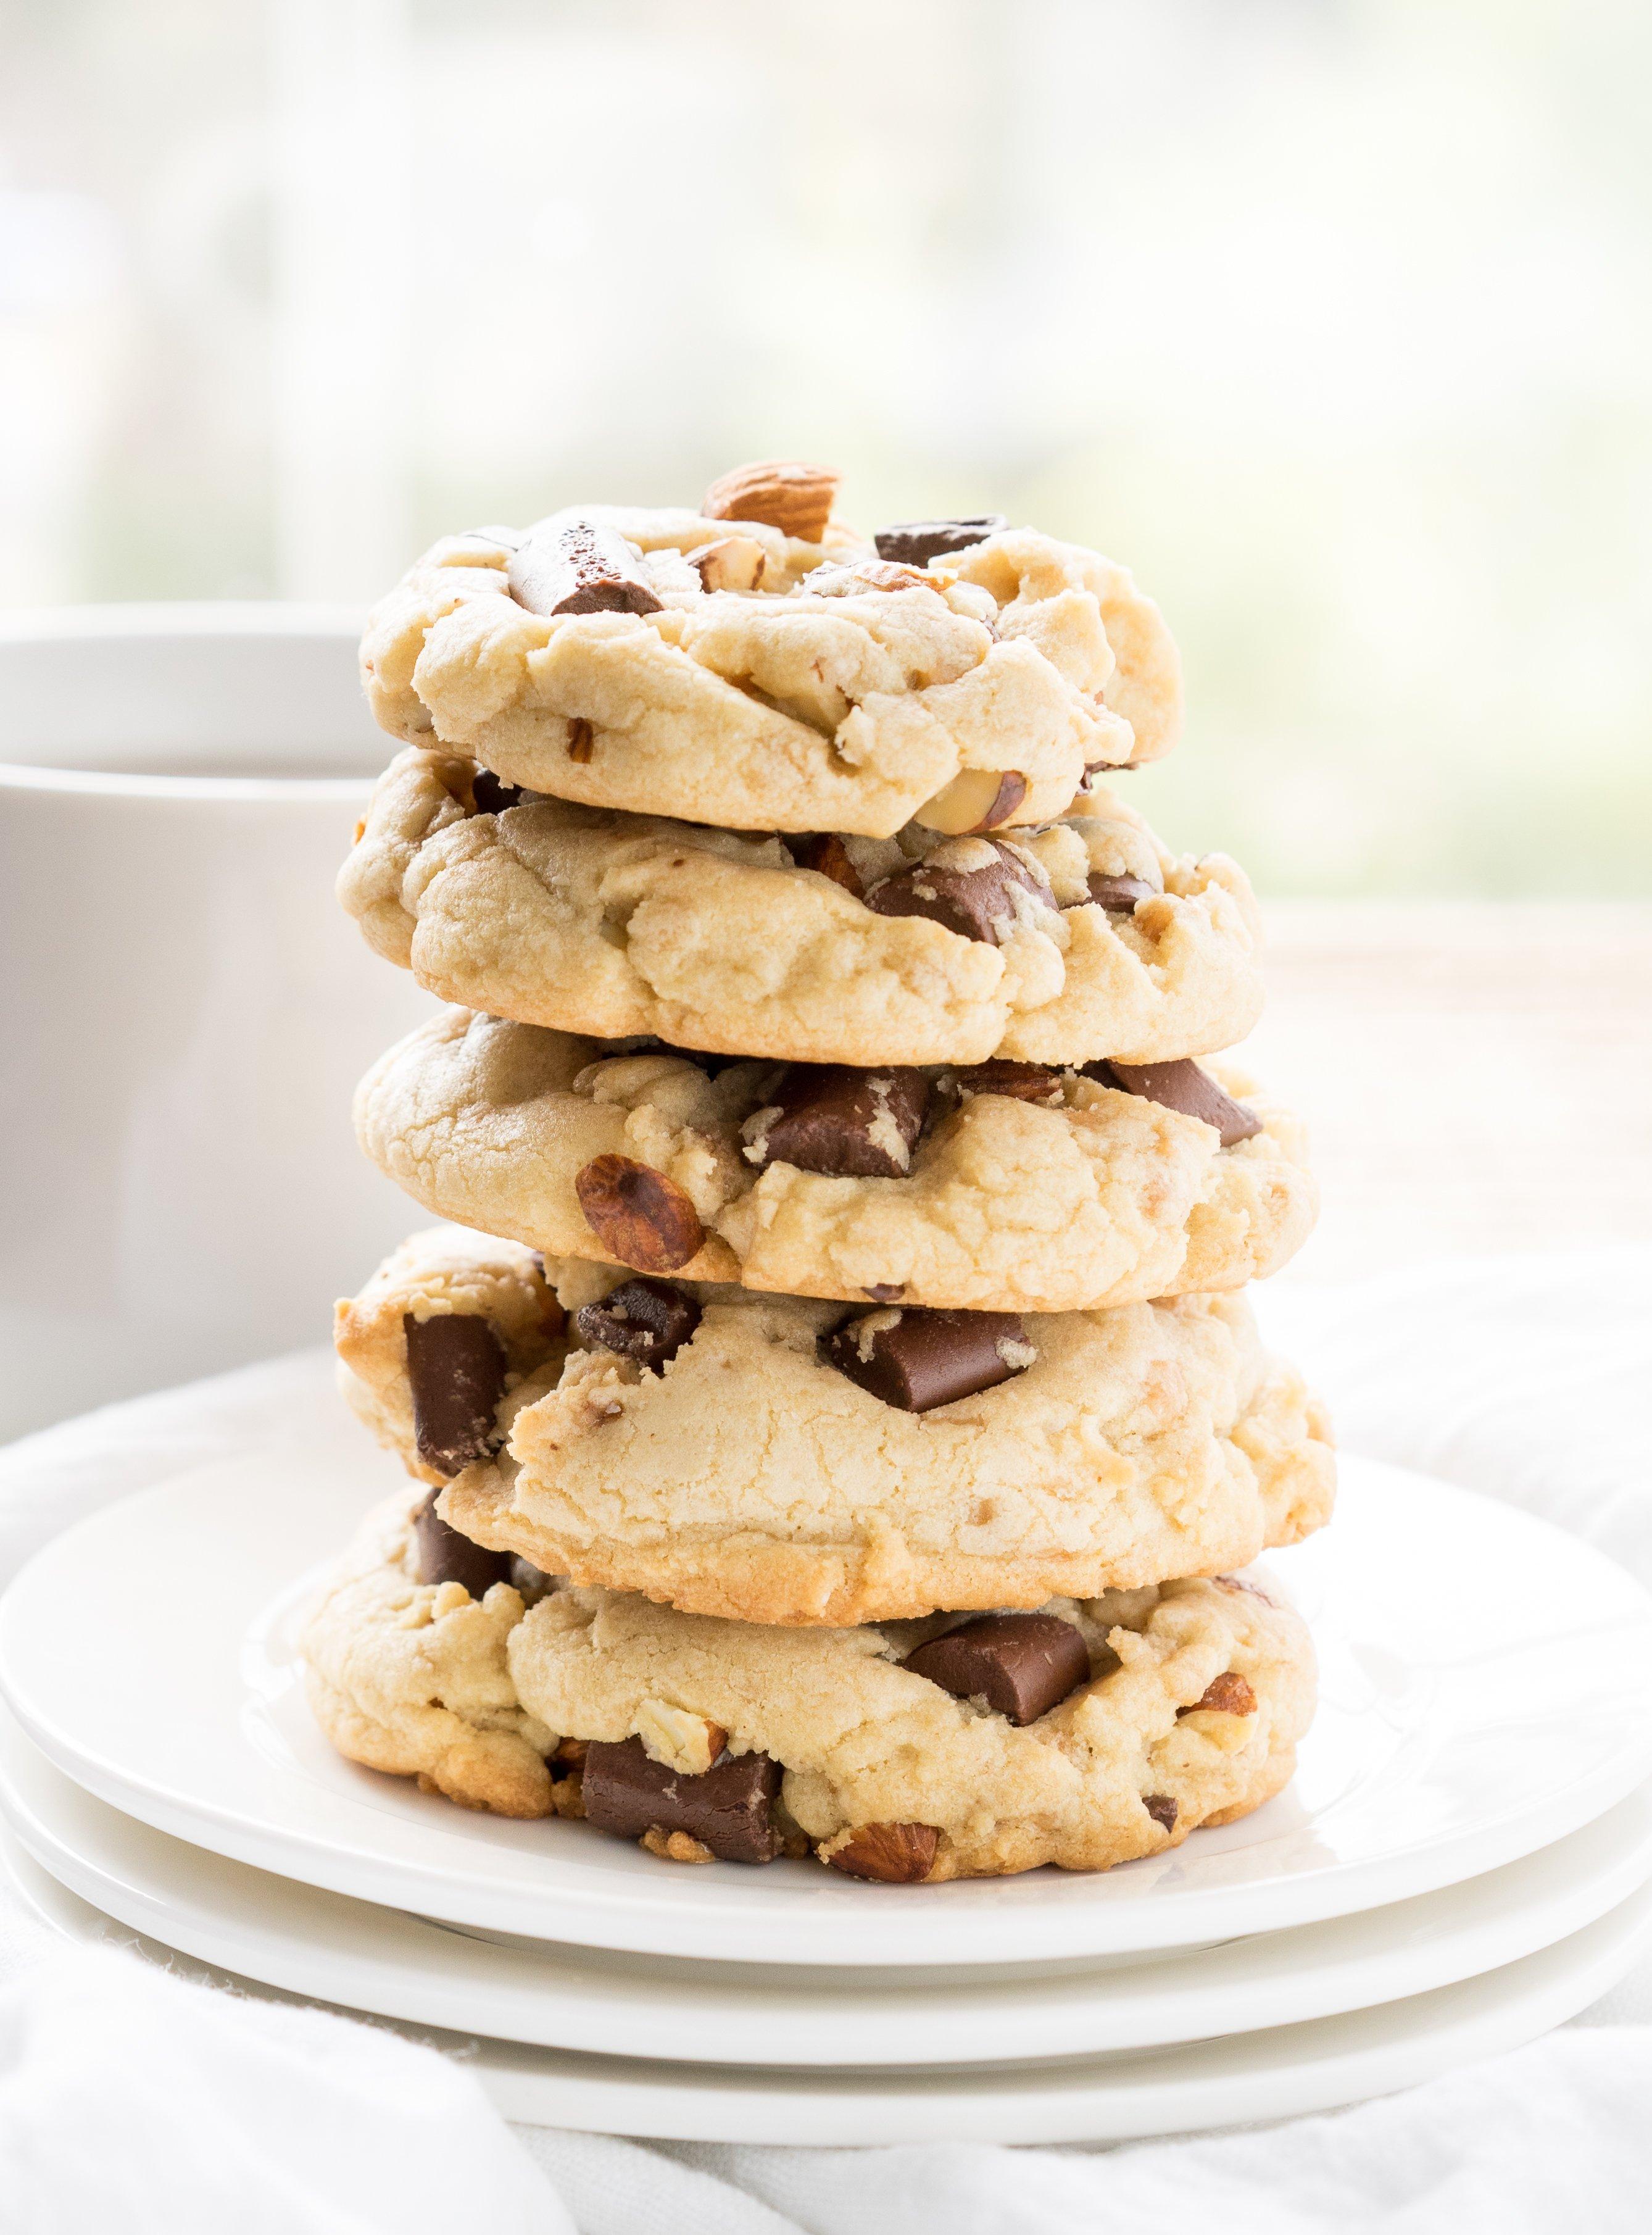 Almond Toffee Chocolate Chunk Cookies